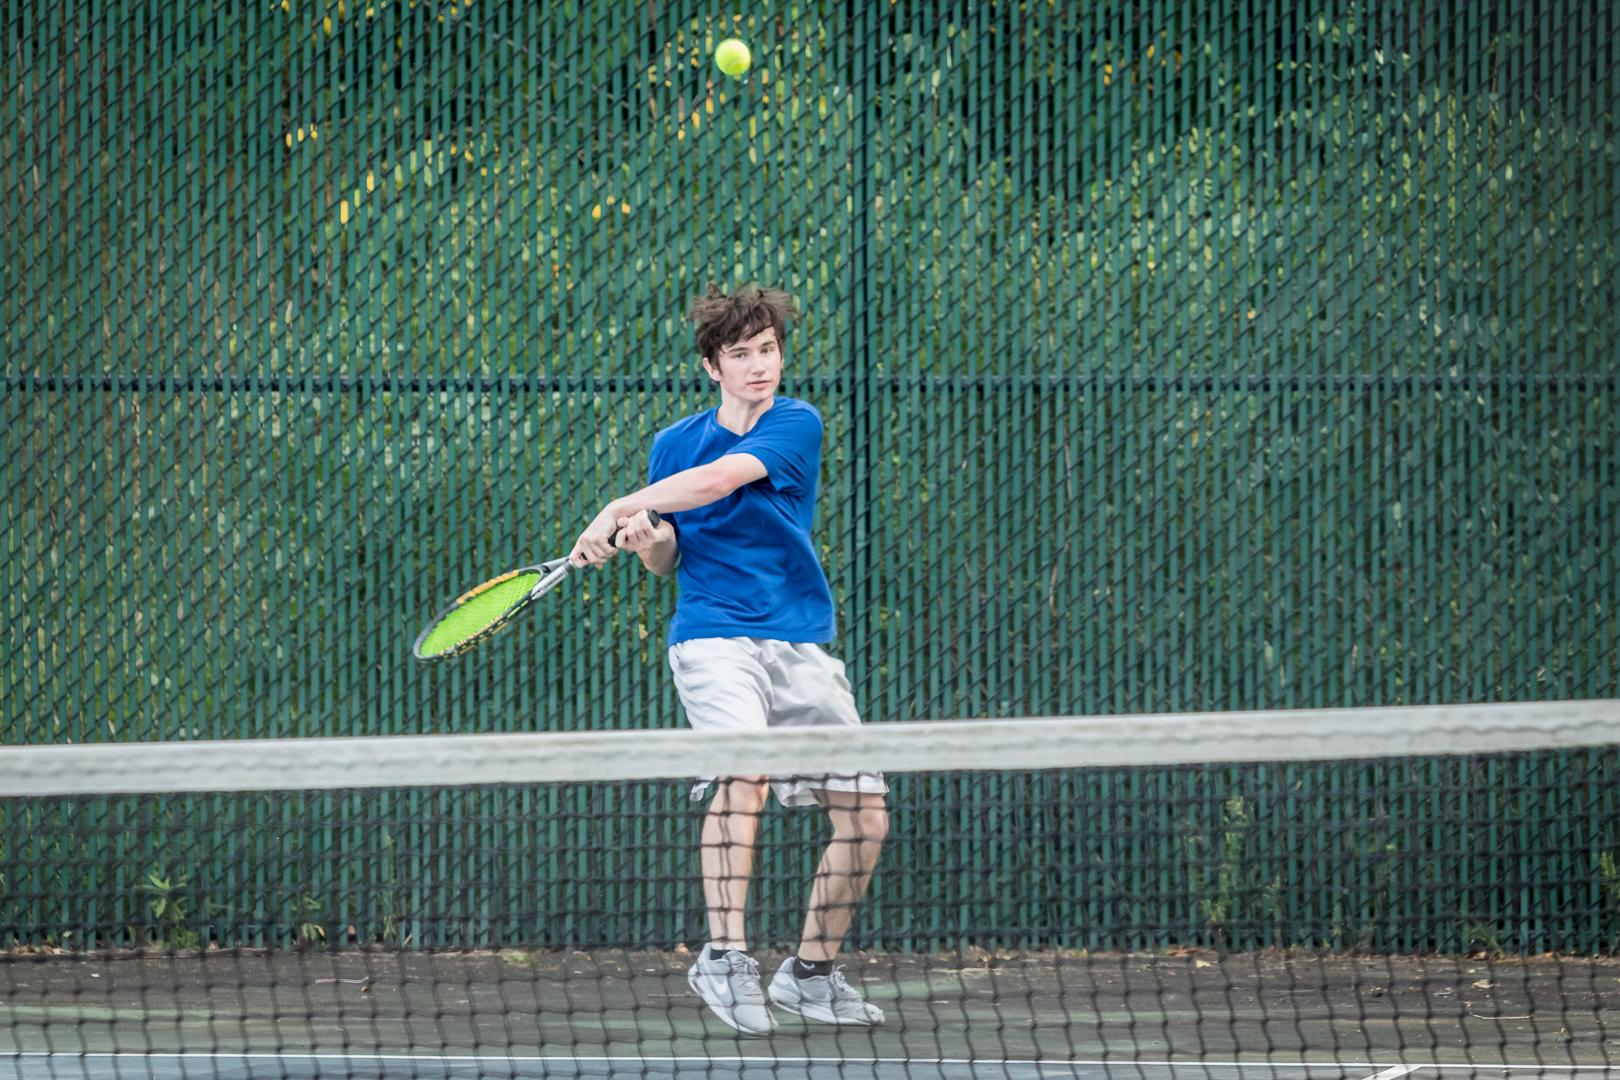 Marian-Boys-Tennis-1623.jpg